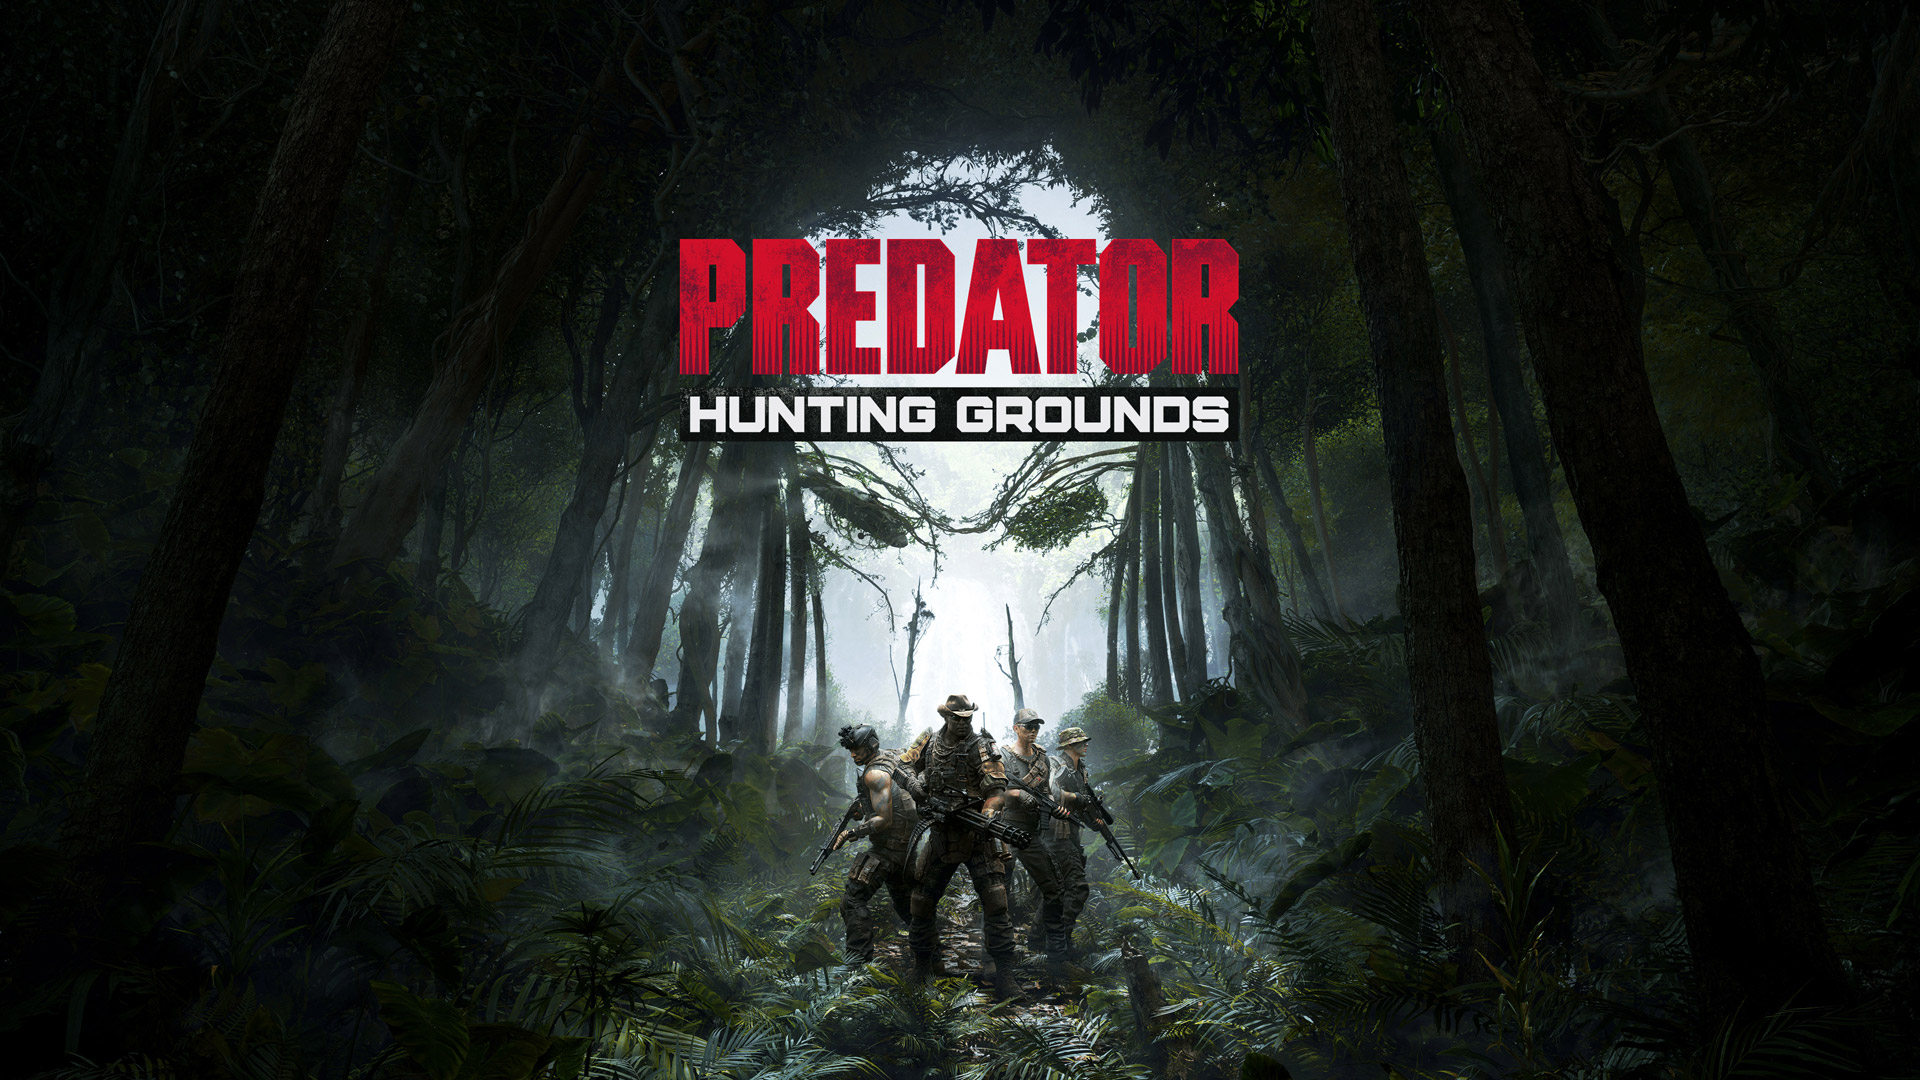 Free Predator: Hunting Grounds Wallpaper in 1920x1080